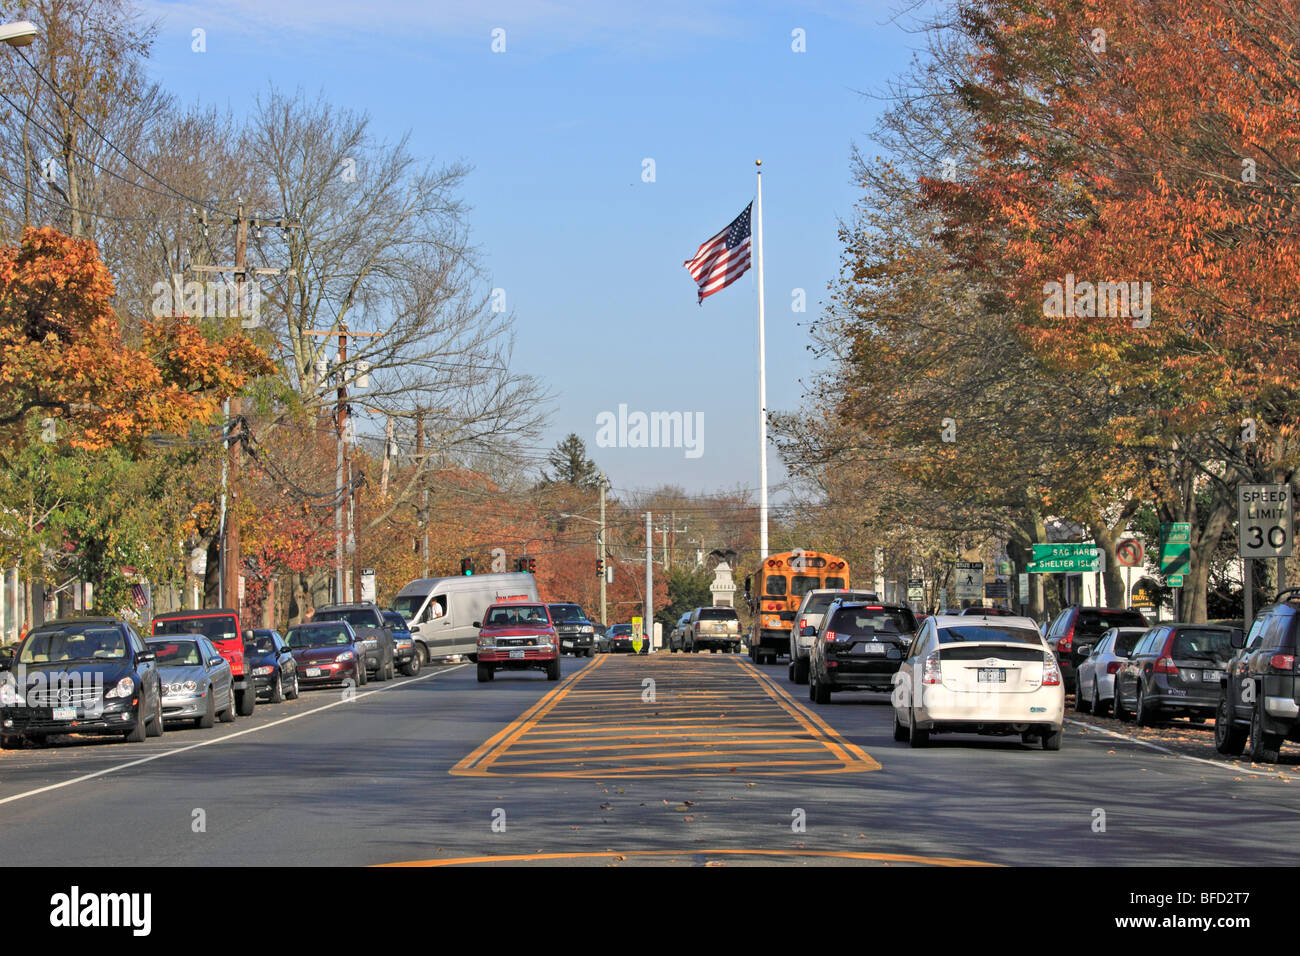 Main St. (Montauk Highway) Bridgehampton, Long Island, NY - Stock Image